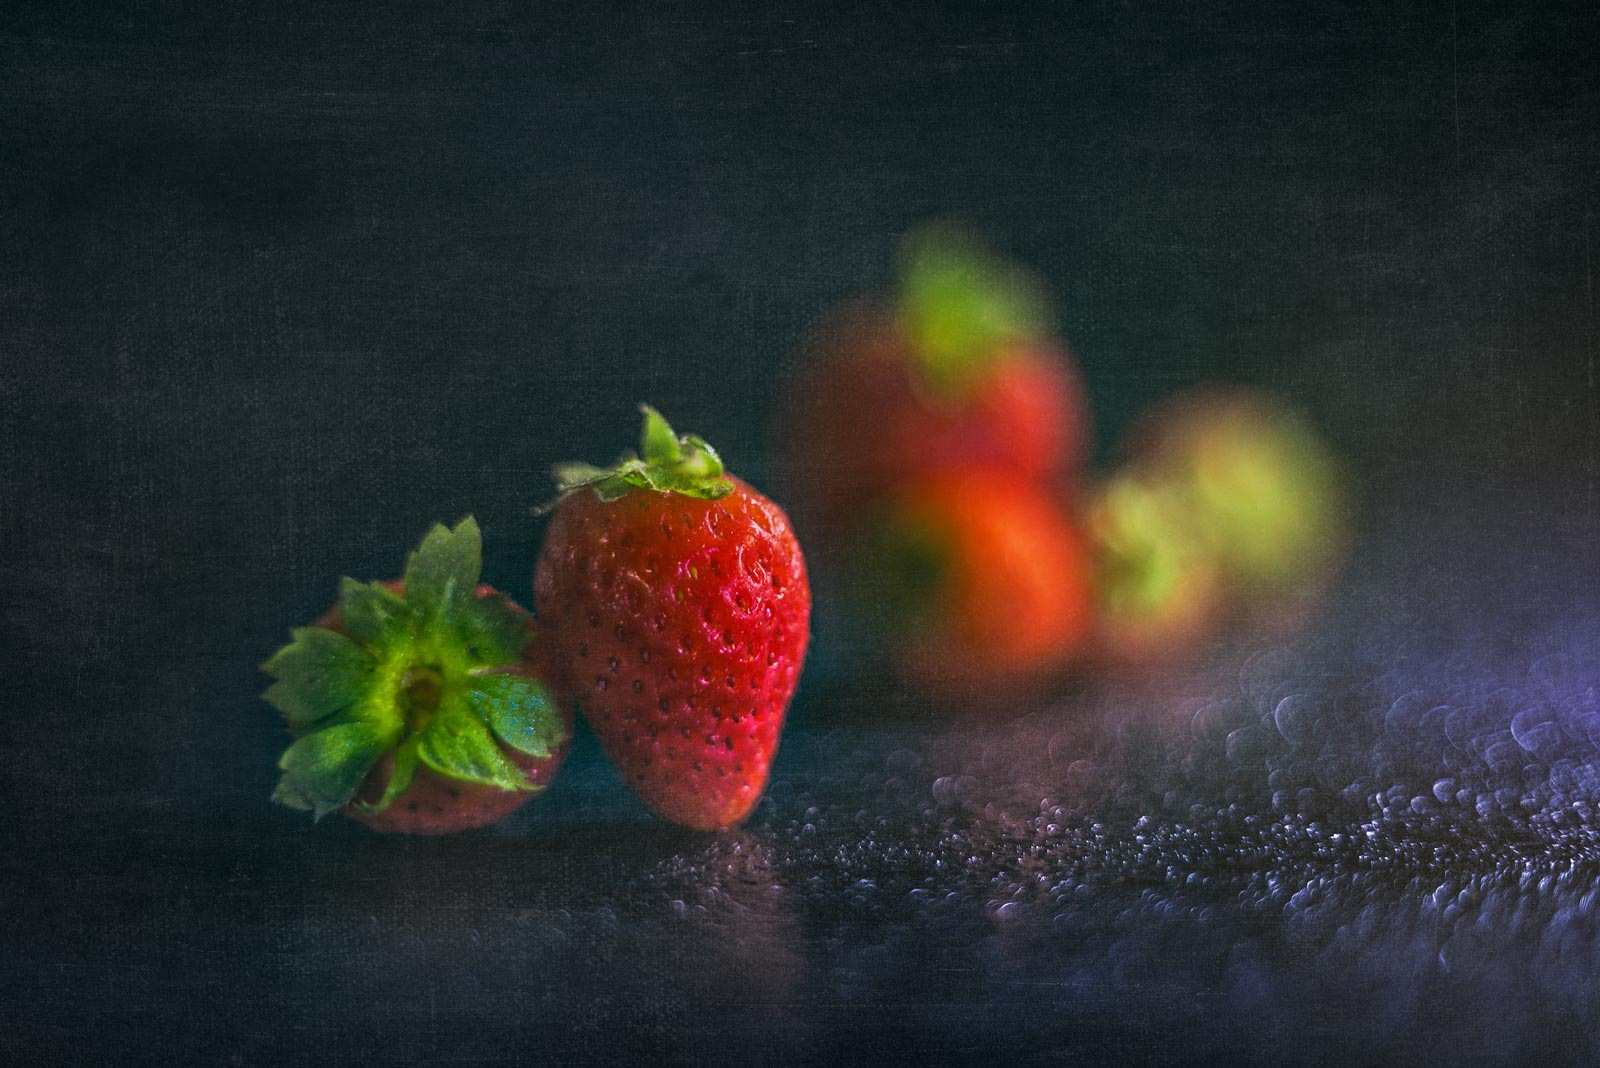 Strawberries by Rosana